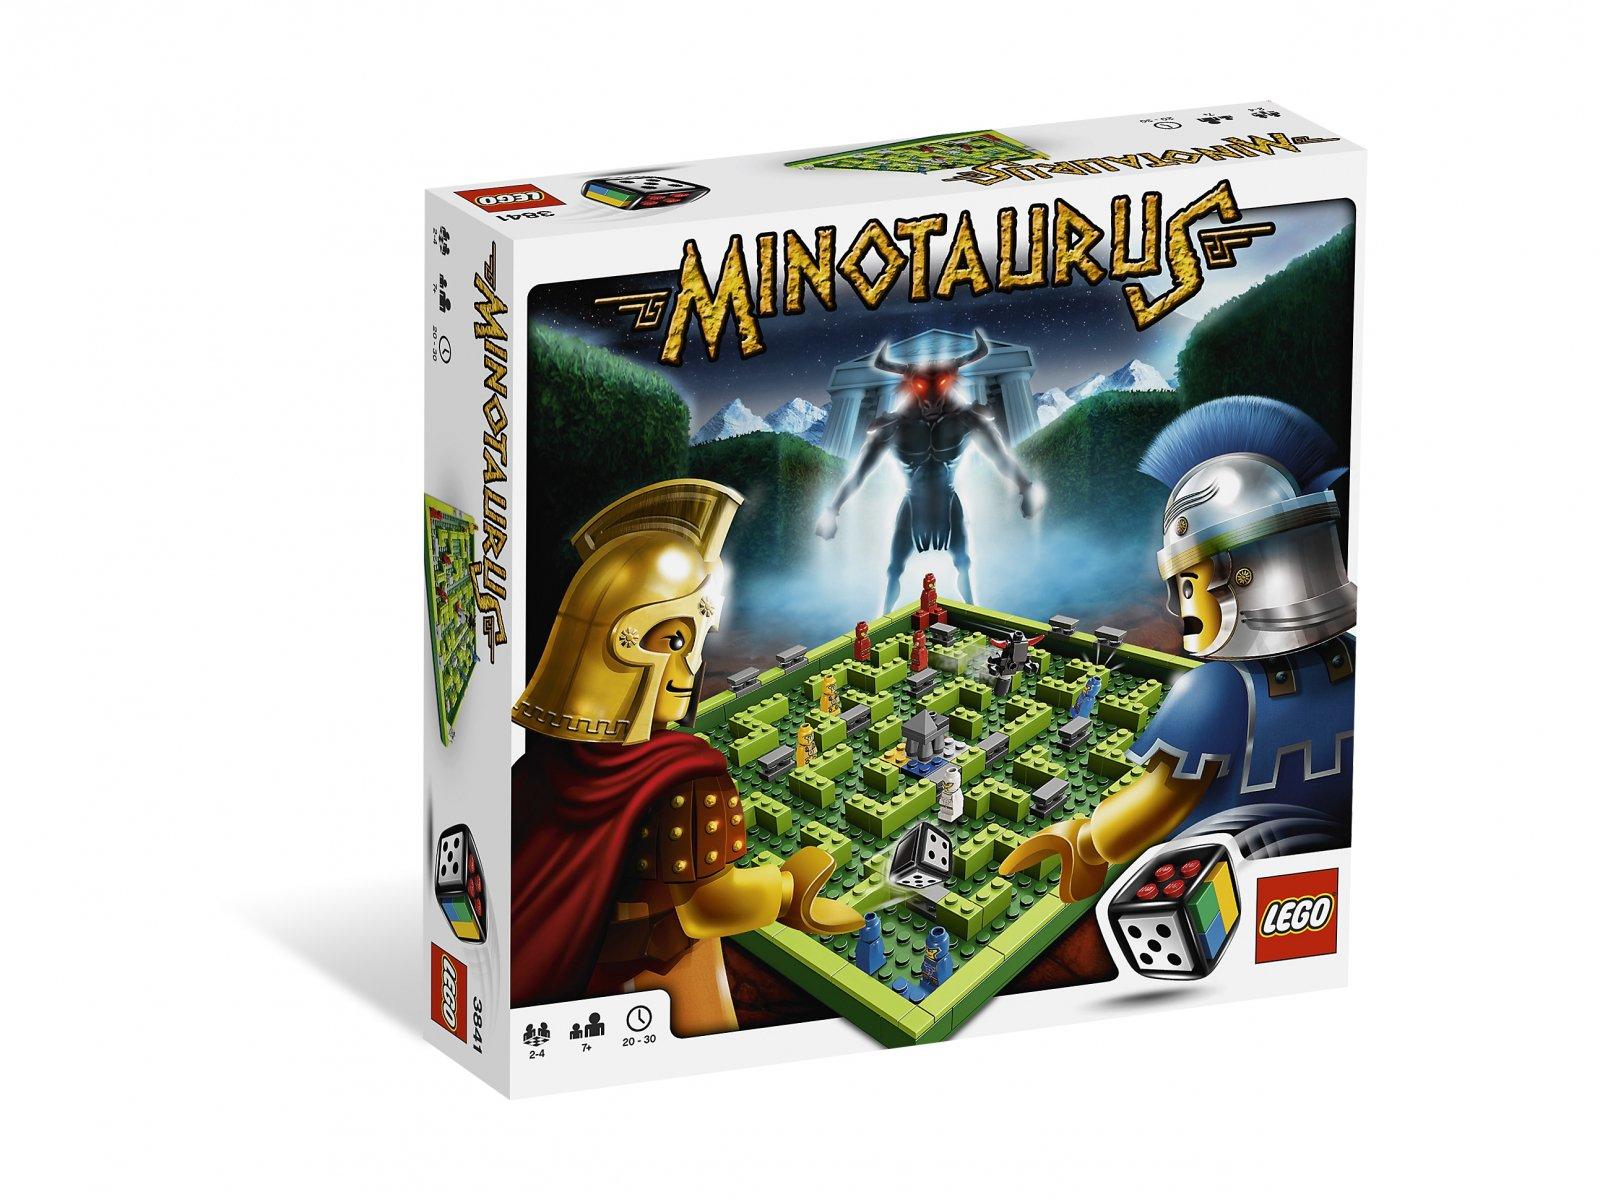 Lego 3841 Games Minotaurus Porownaj Ceny Zklockow Pl